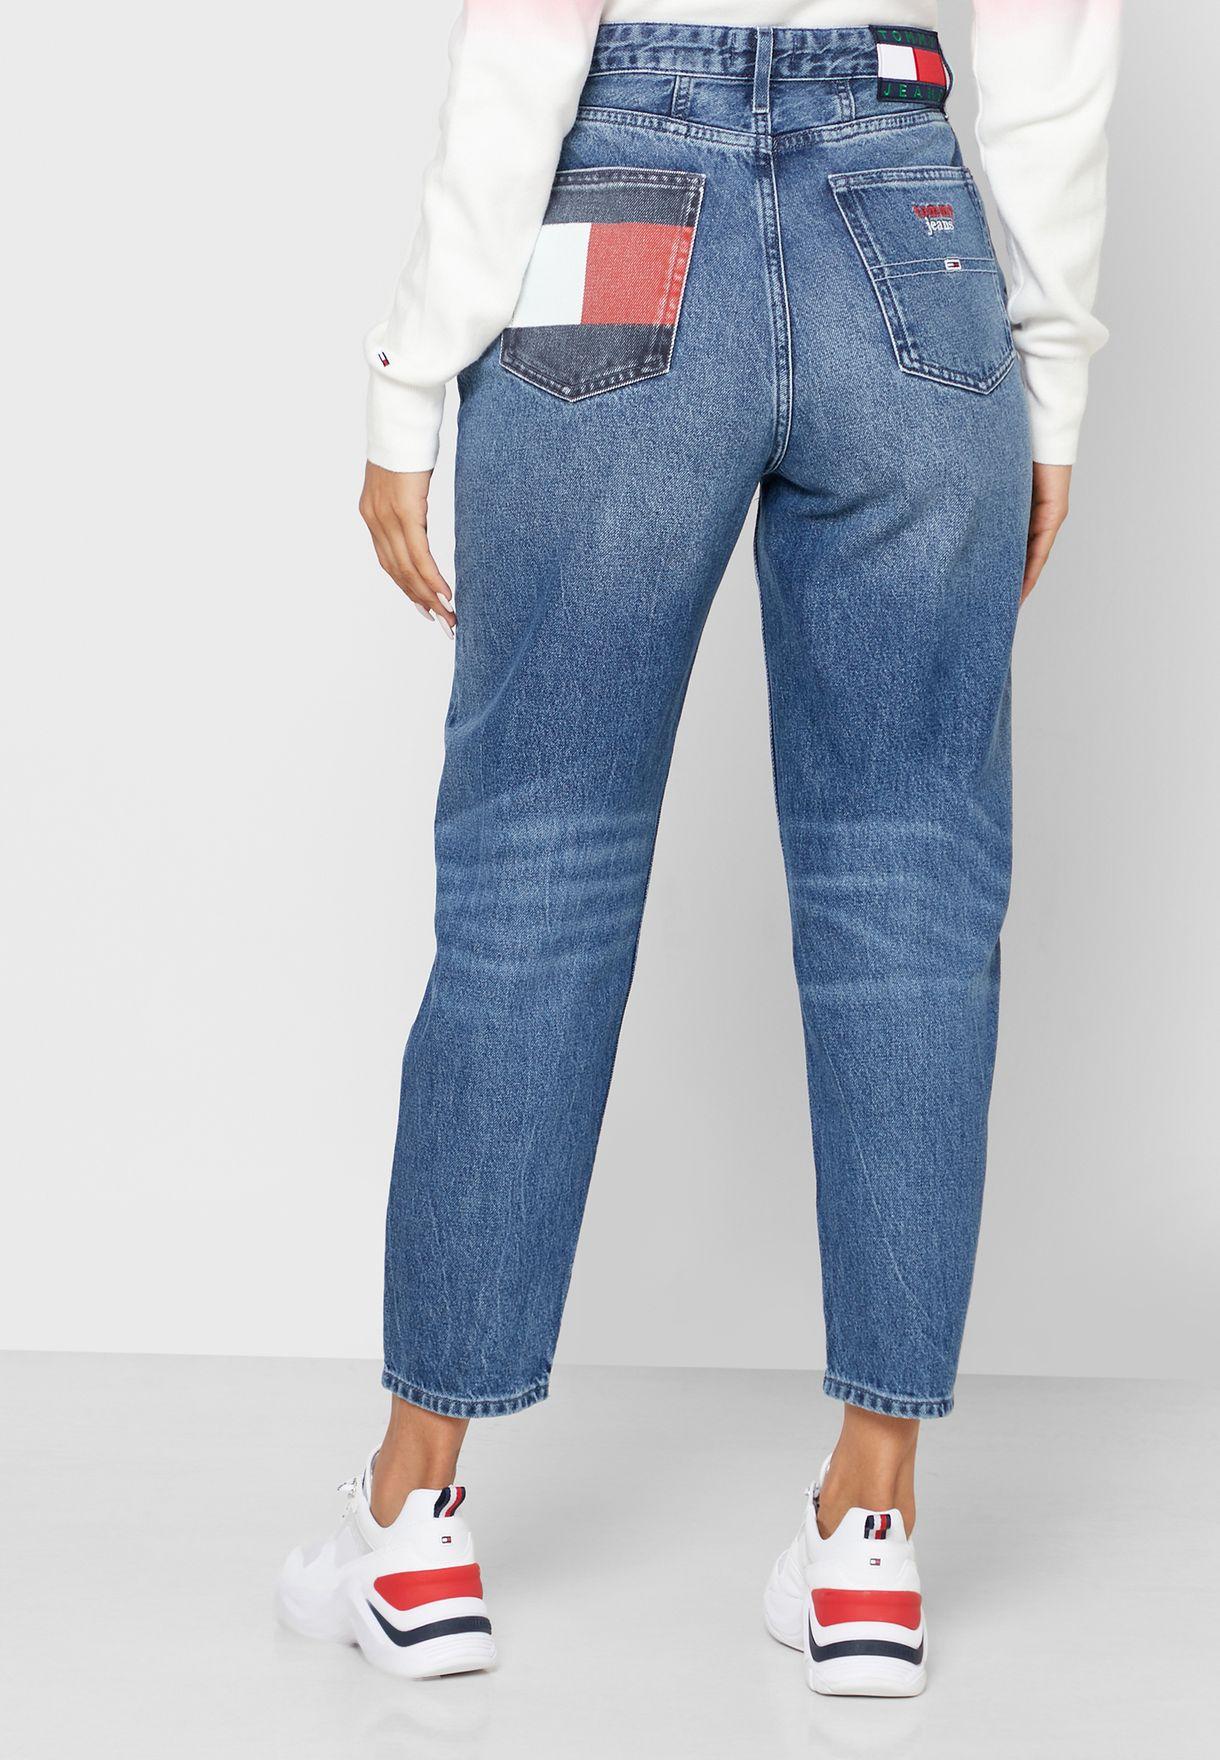 جينز بأزرار